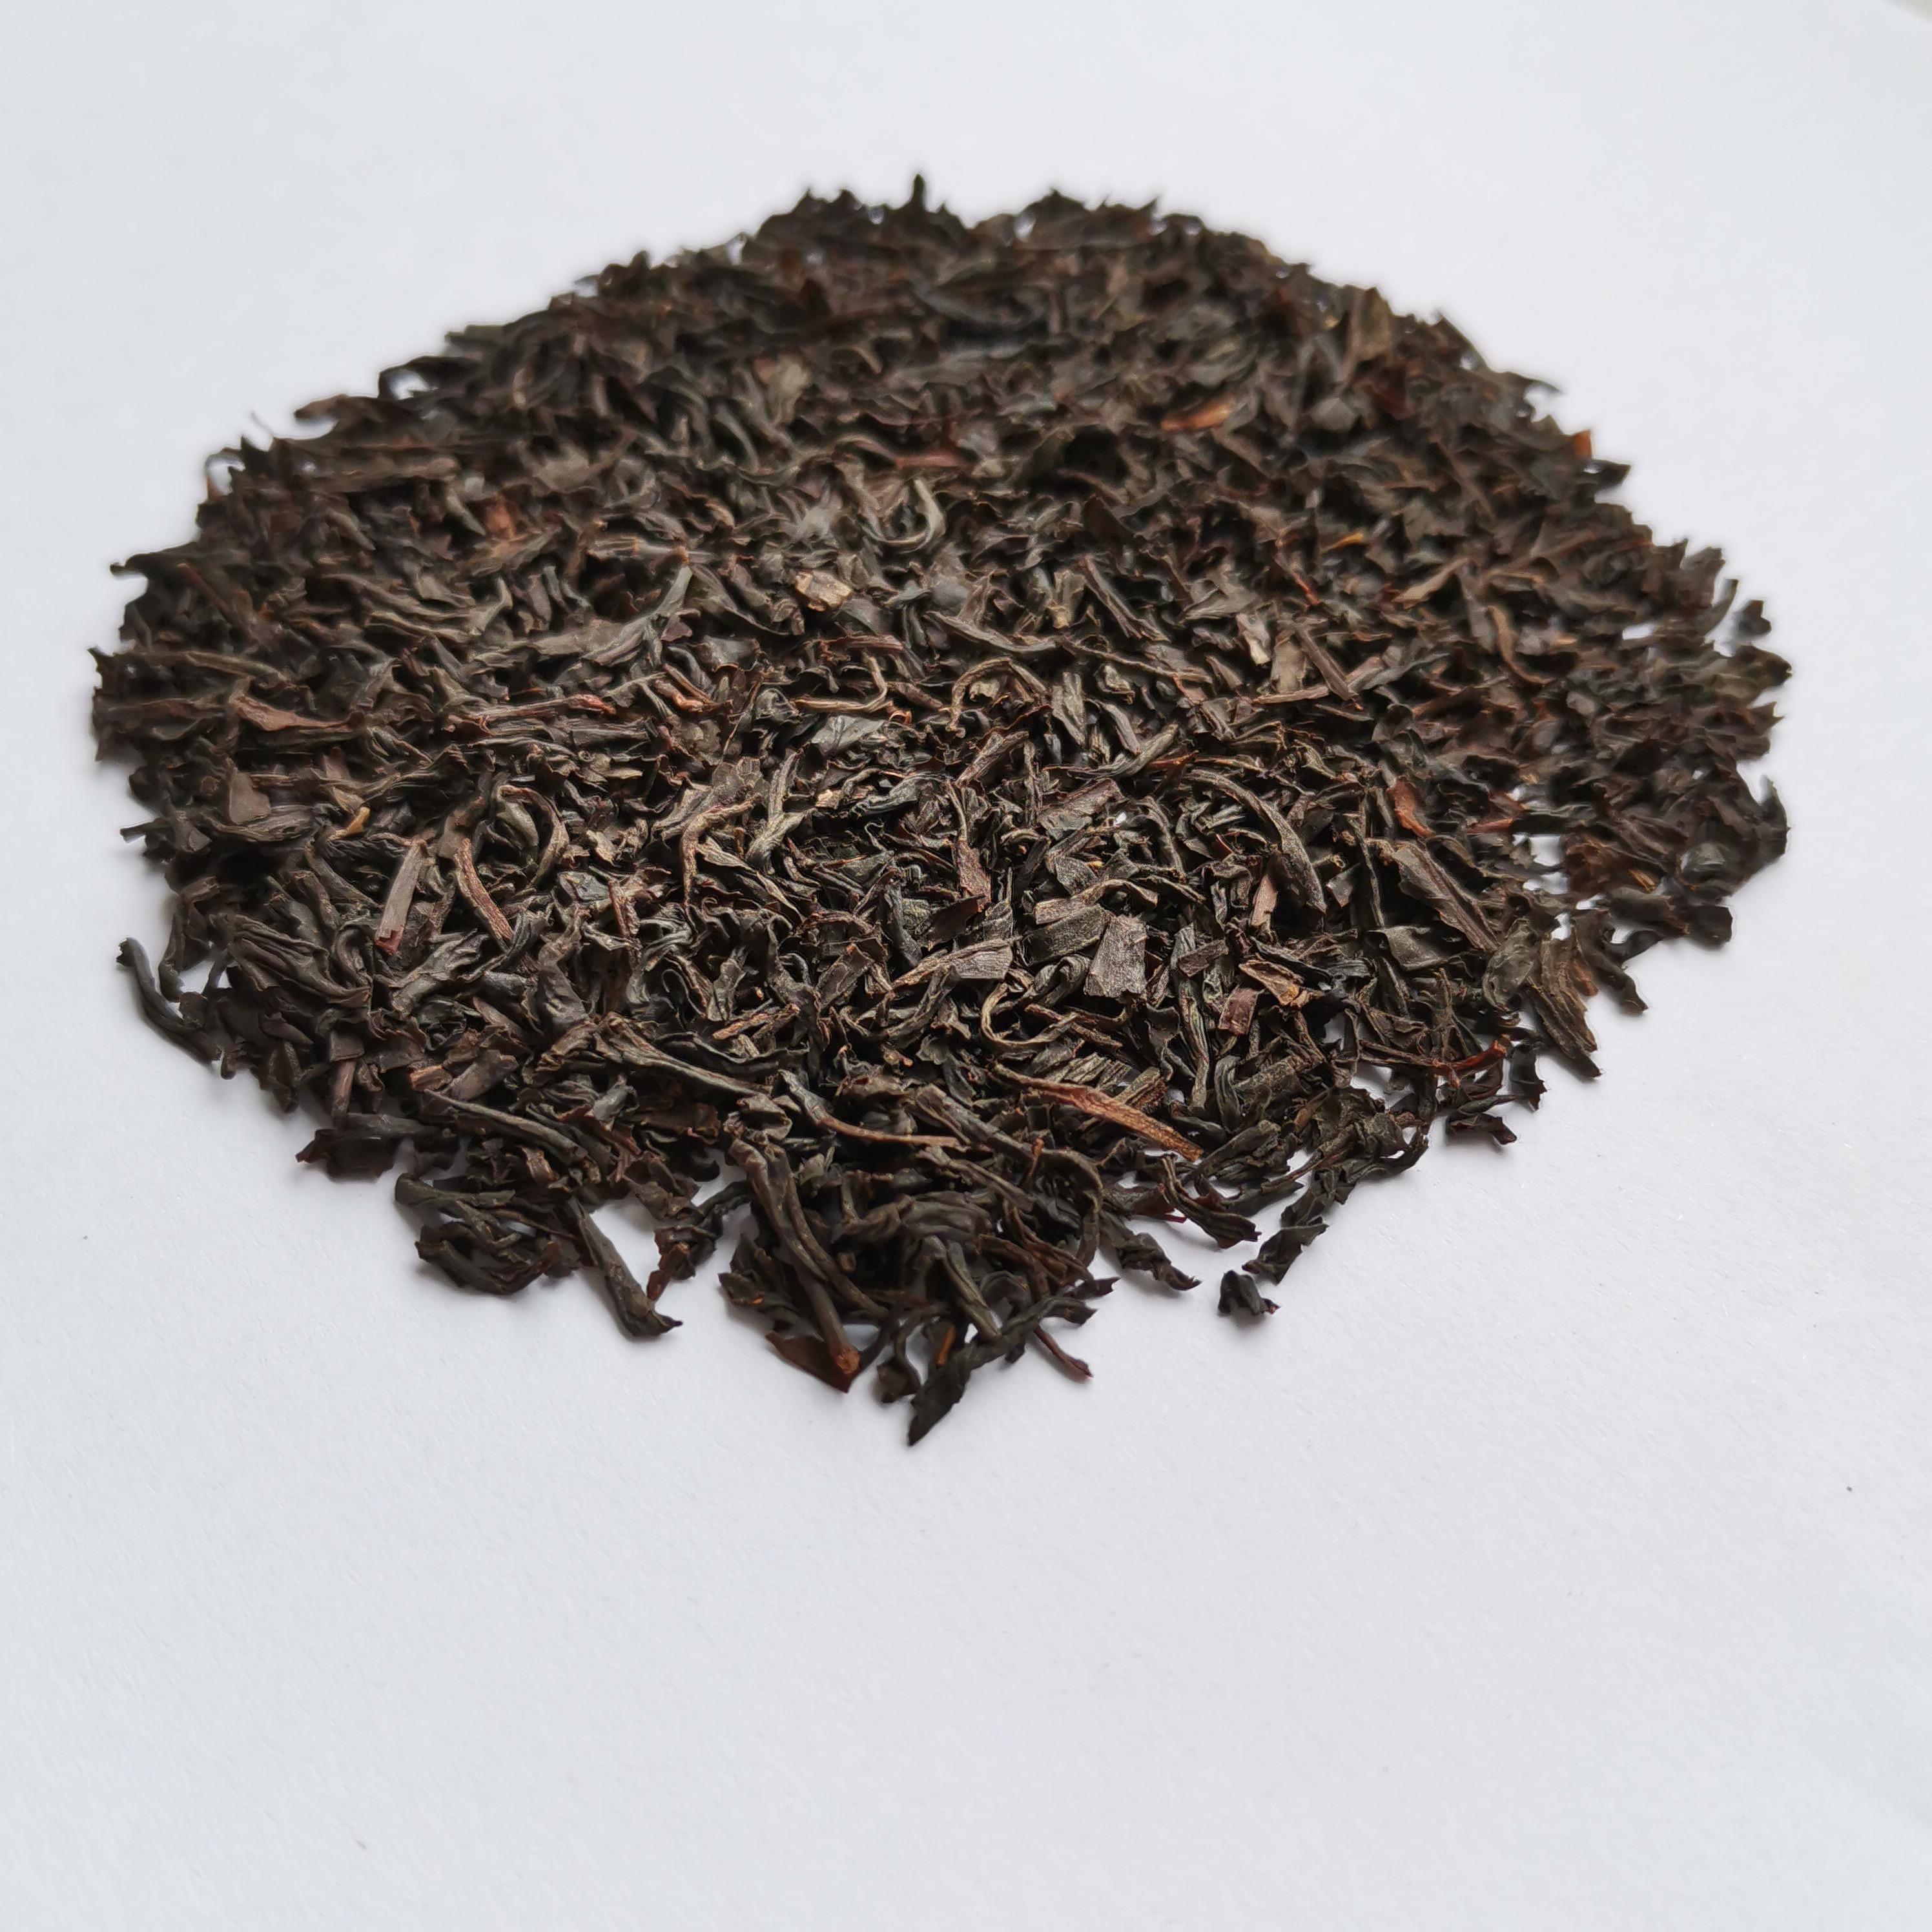 Chinese famous high quality herbal natural black tea wholesale Keemum Black Tea in bulk 50g/tin - 4uTea | 4uTea.com